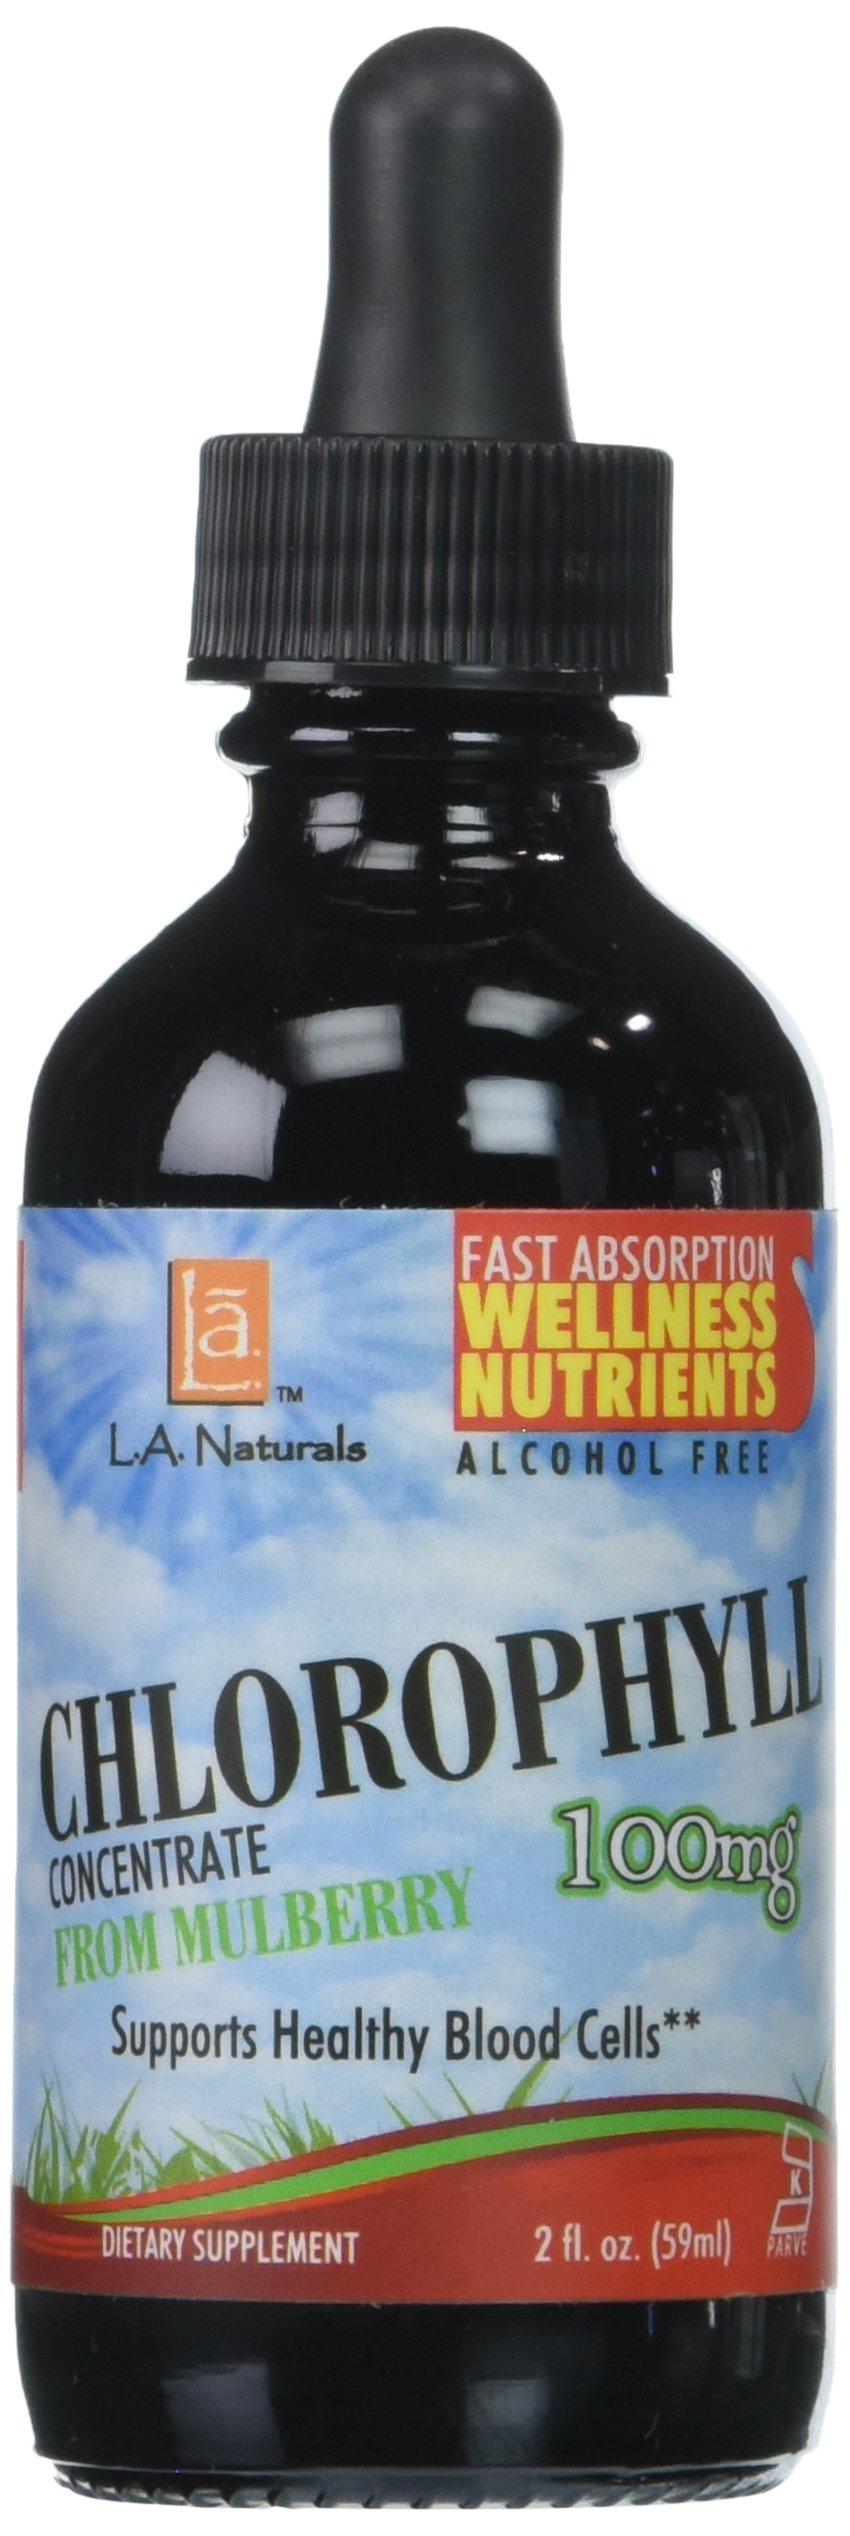 L A NATURALS Chlorophyll 100mg, 0.02 Pound